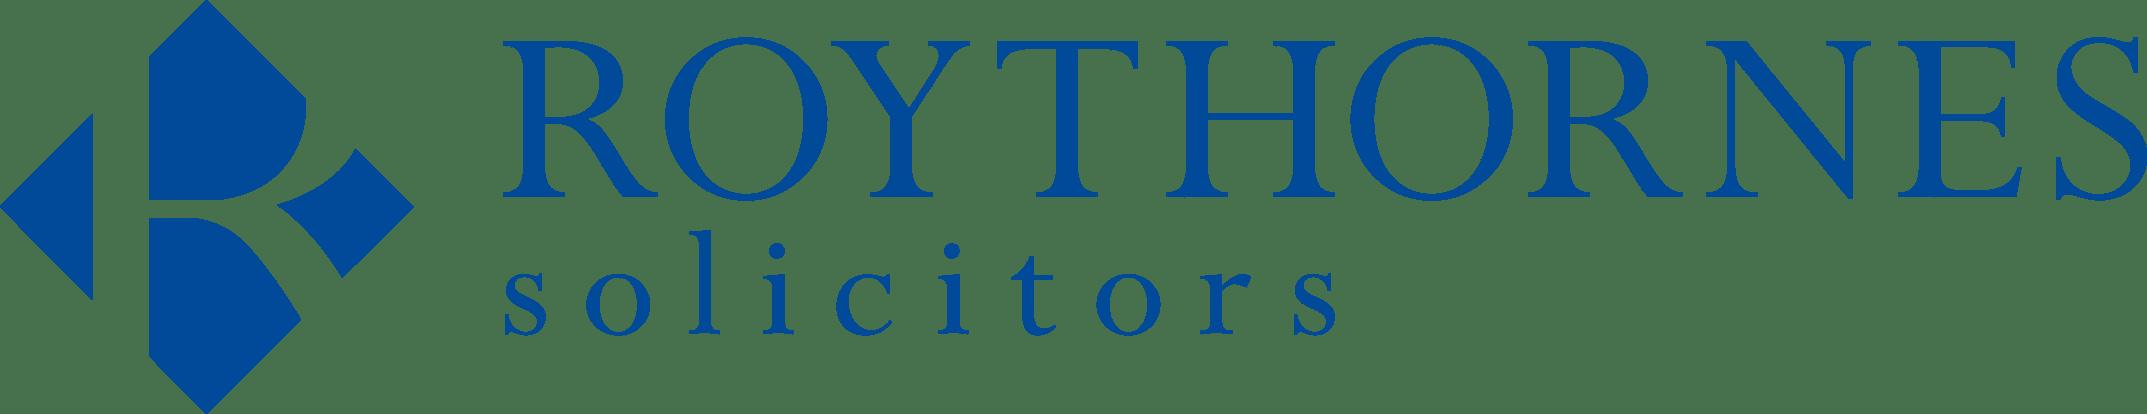 Roythornes Solicitors